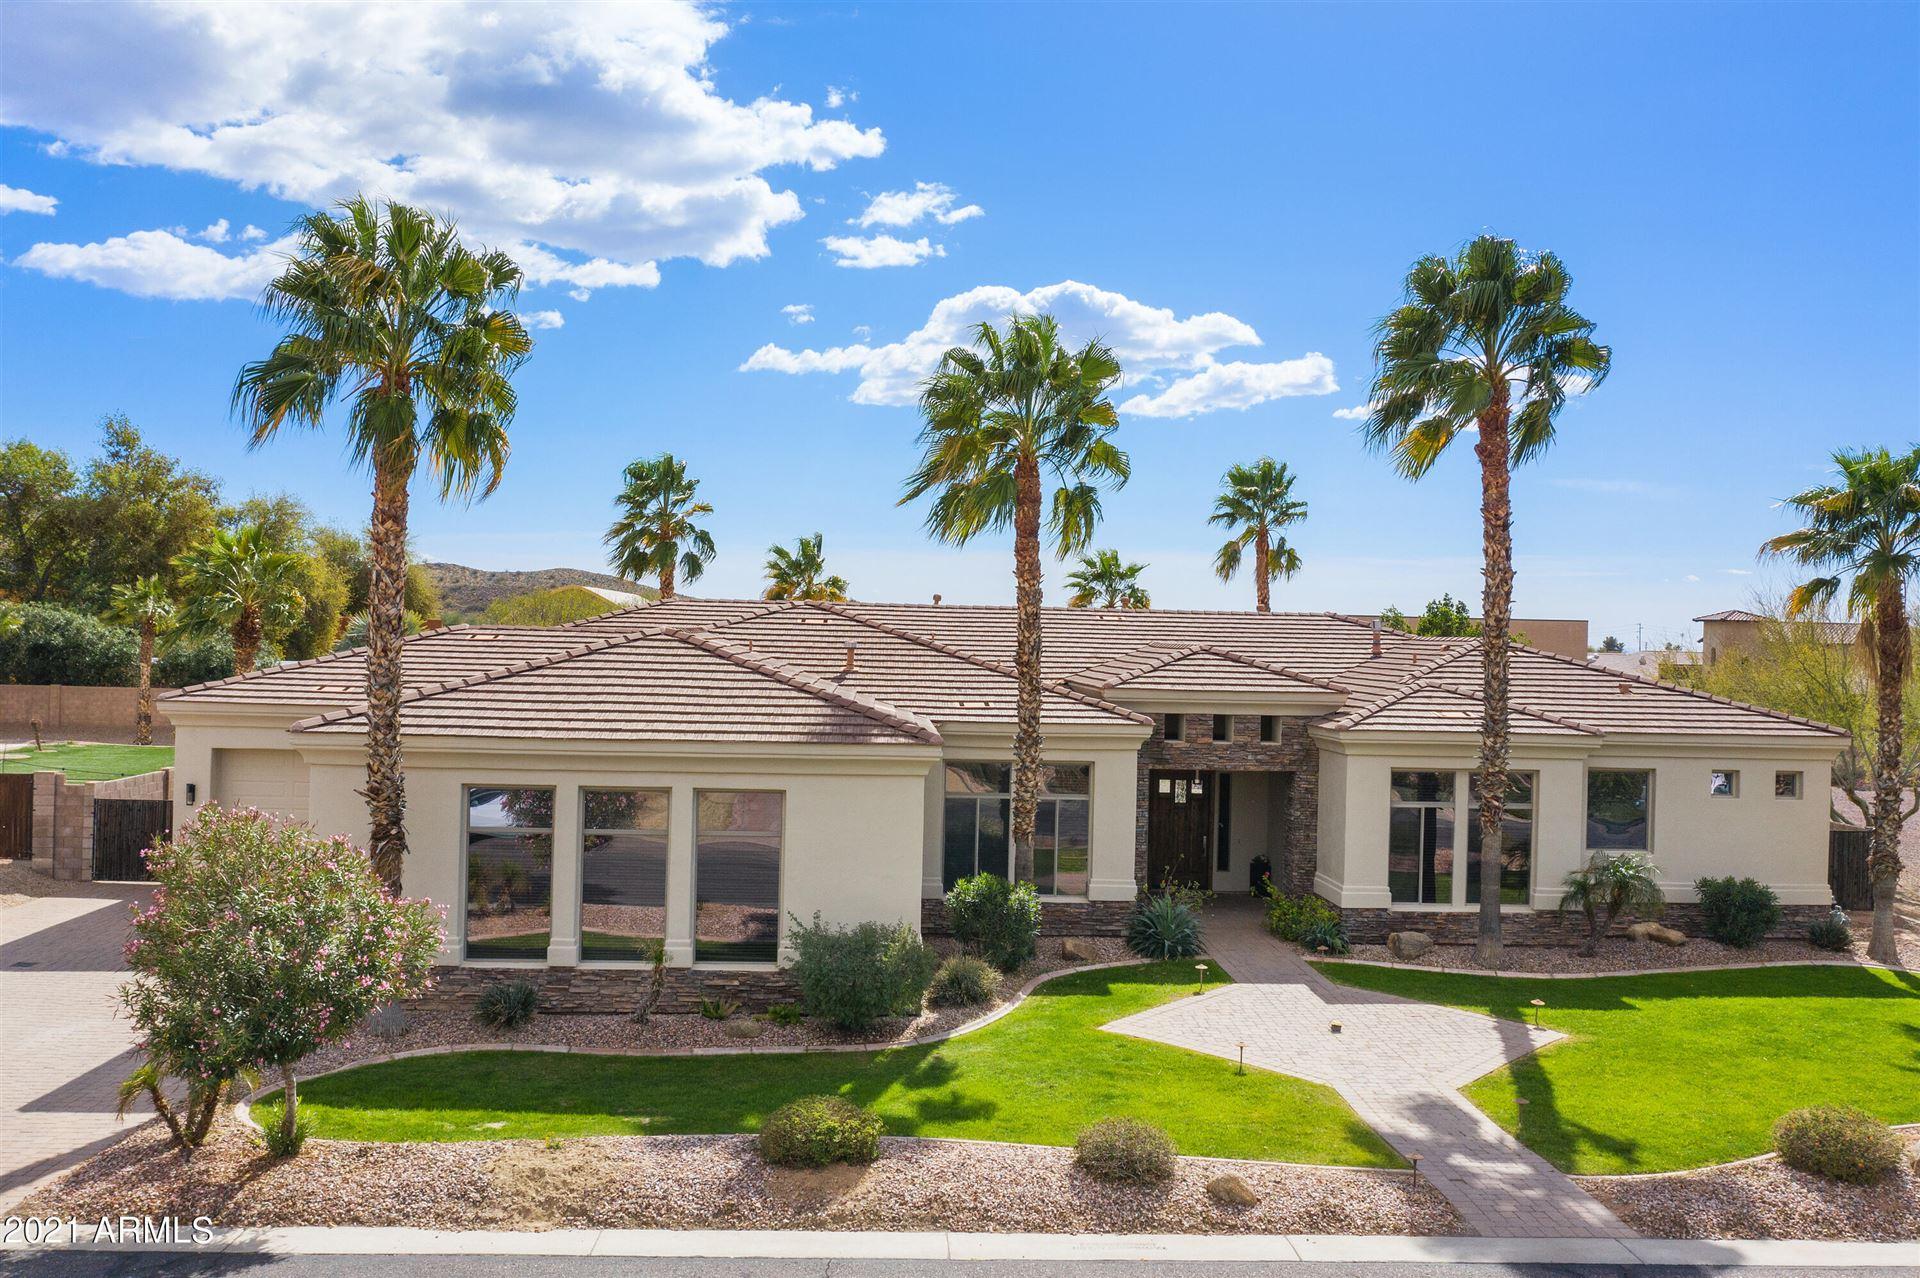 6605 W AVENIDA DEL SOL --, Glendale, AZ 85310 - MLS#: 6197433